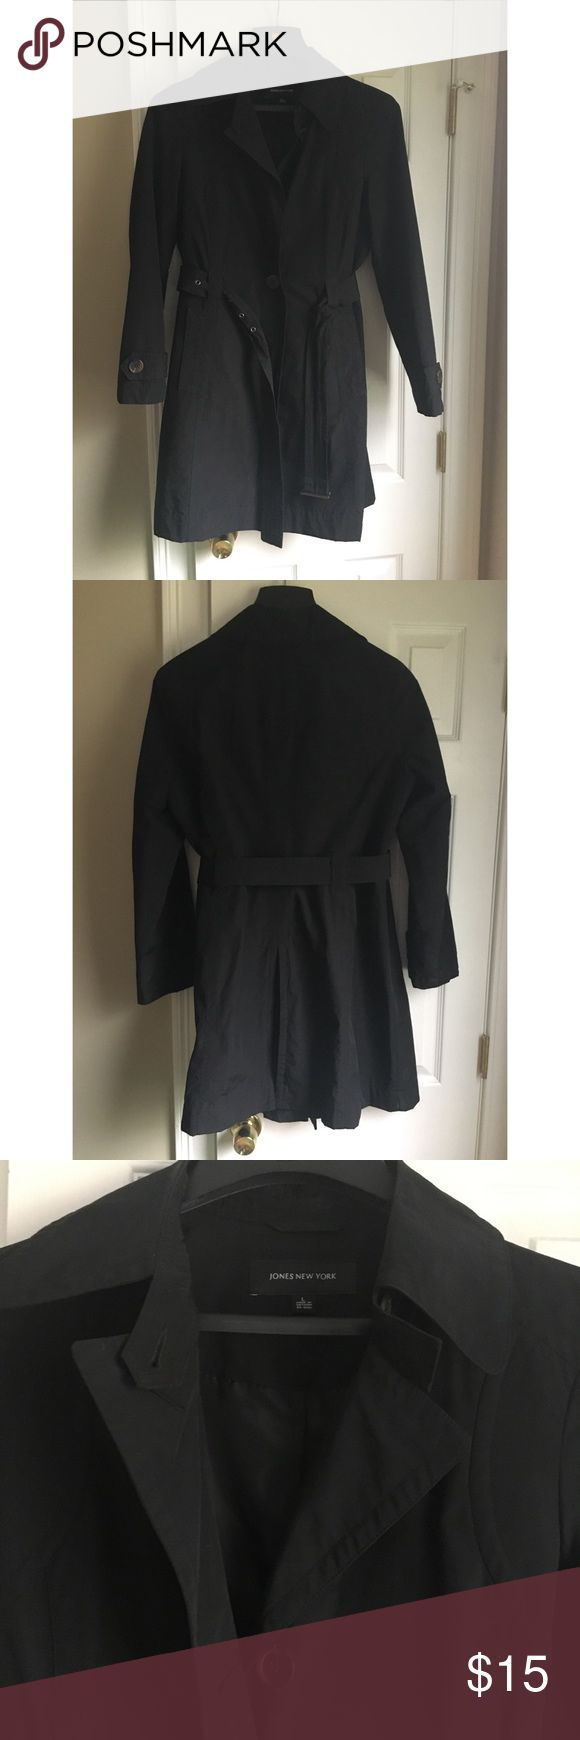 Women's rain coat Black mid length rain coat Button down belted waist Front pockets Jones New York Jackets & Coats Trench Coats